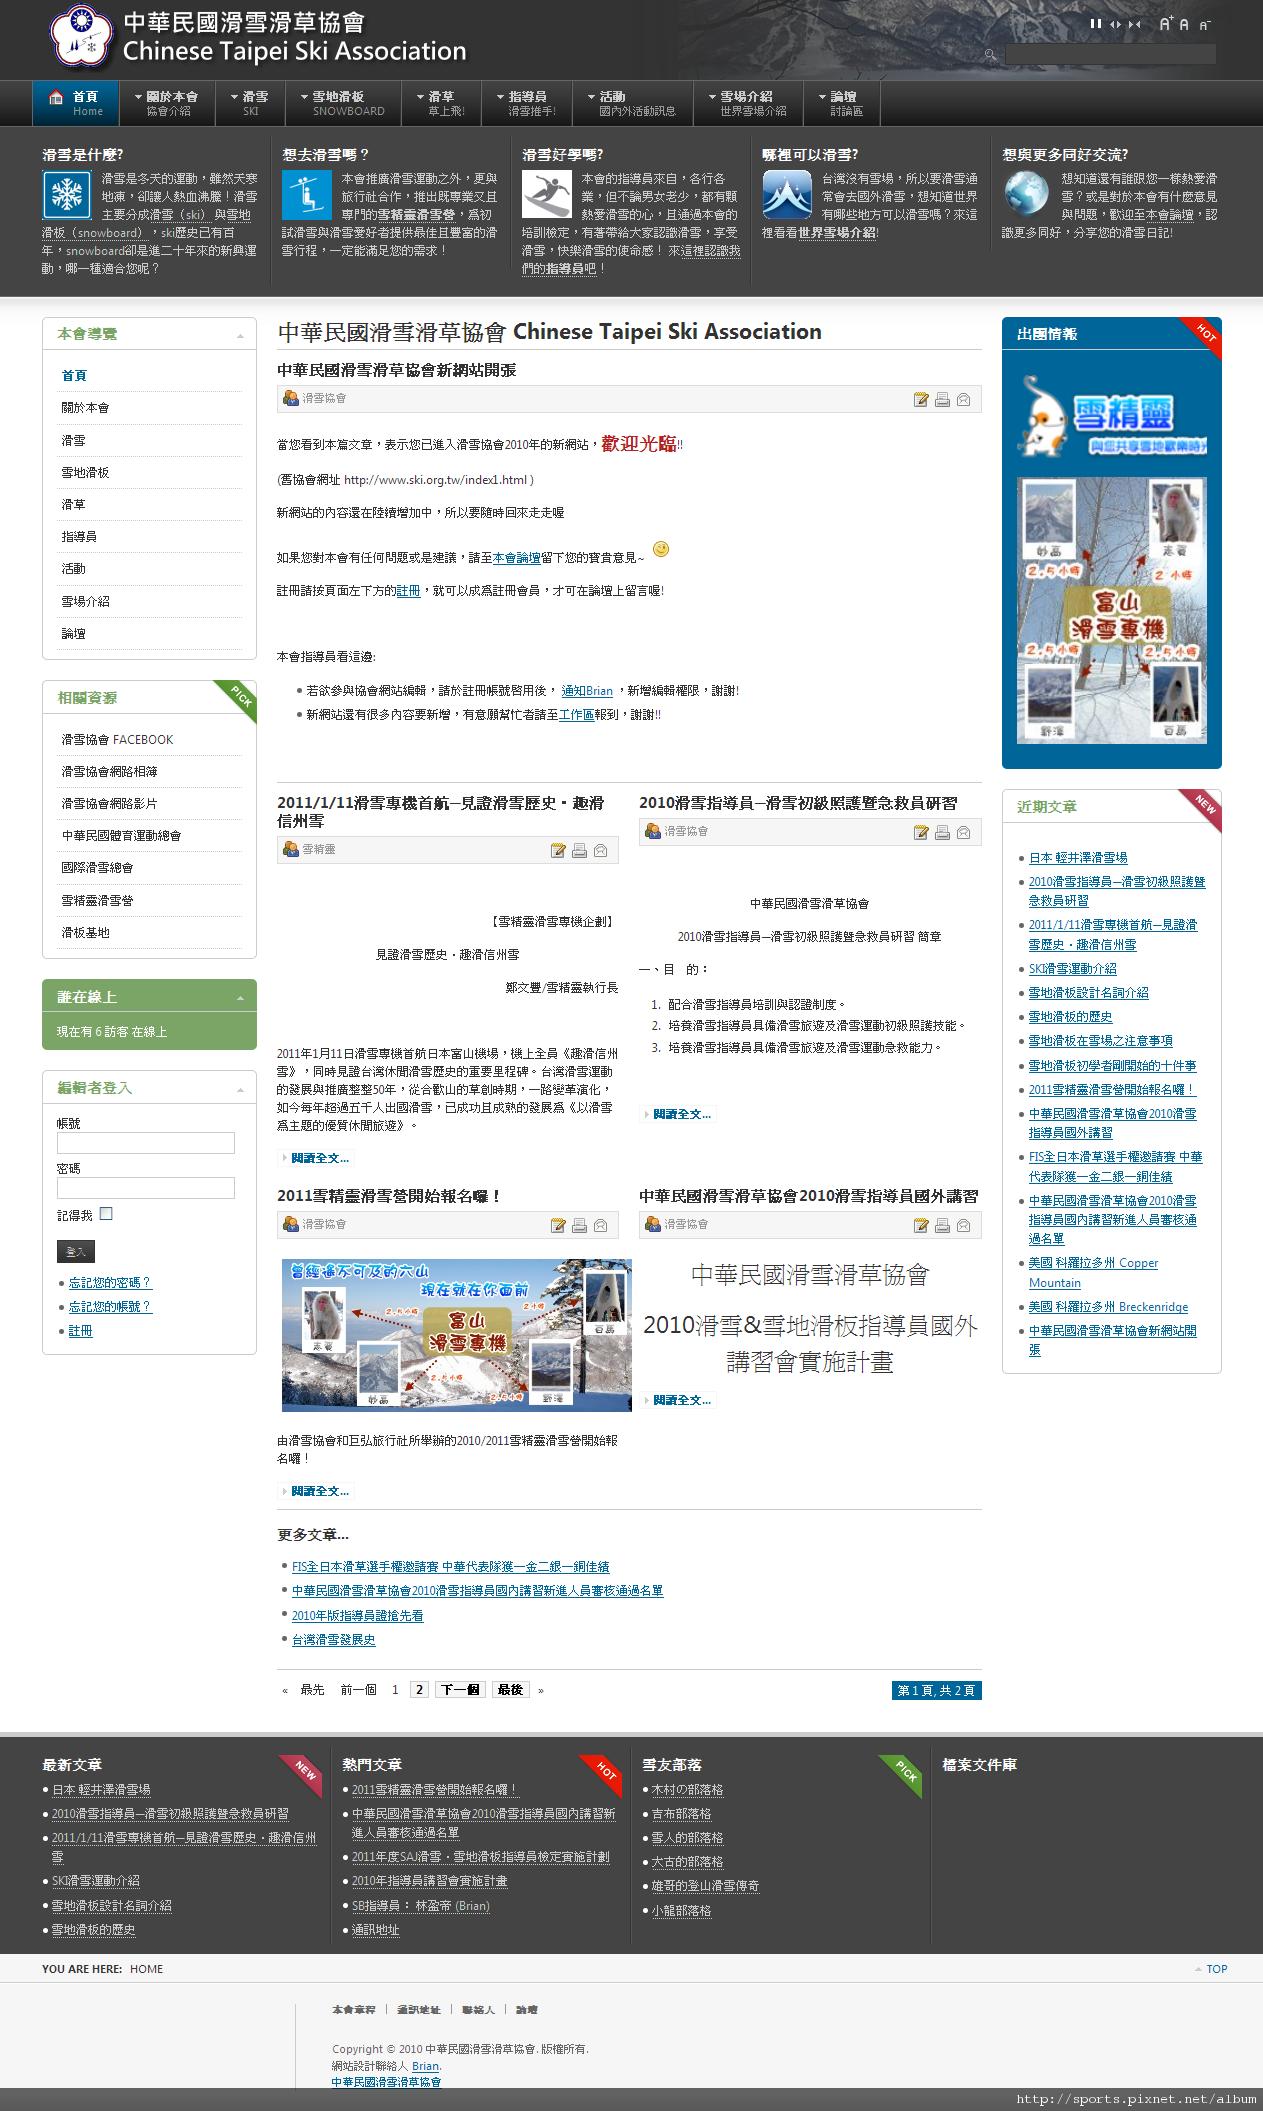 中華民國滑雪滑草協會 Chinese Taipei Ski Association_1288237560439.png